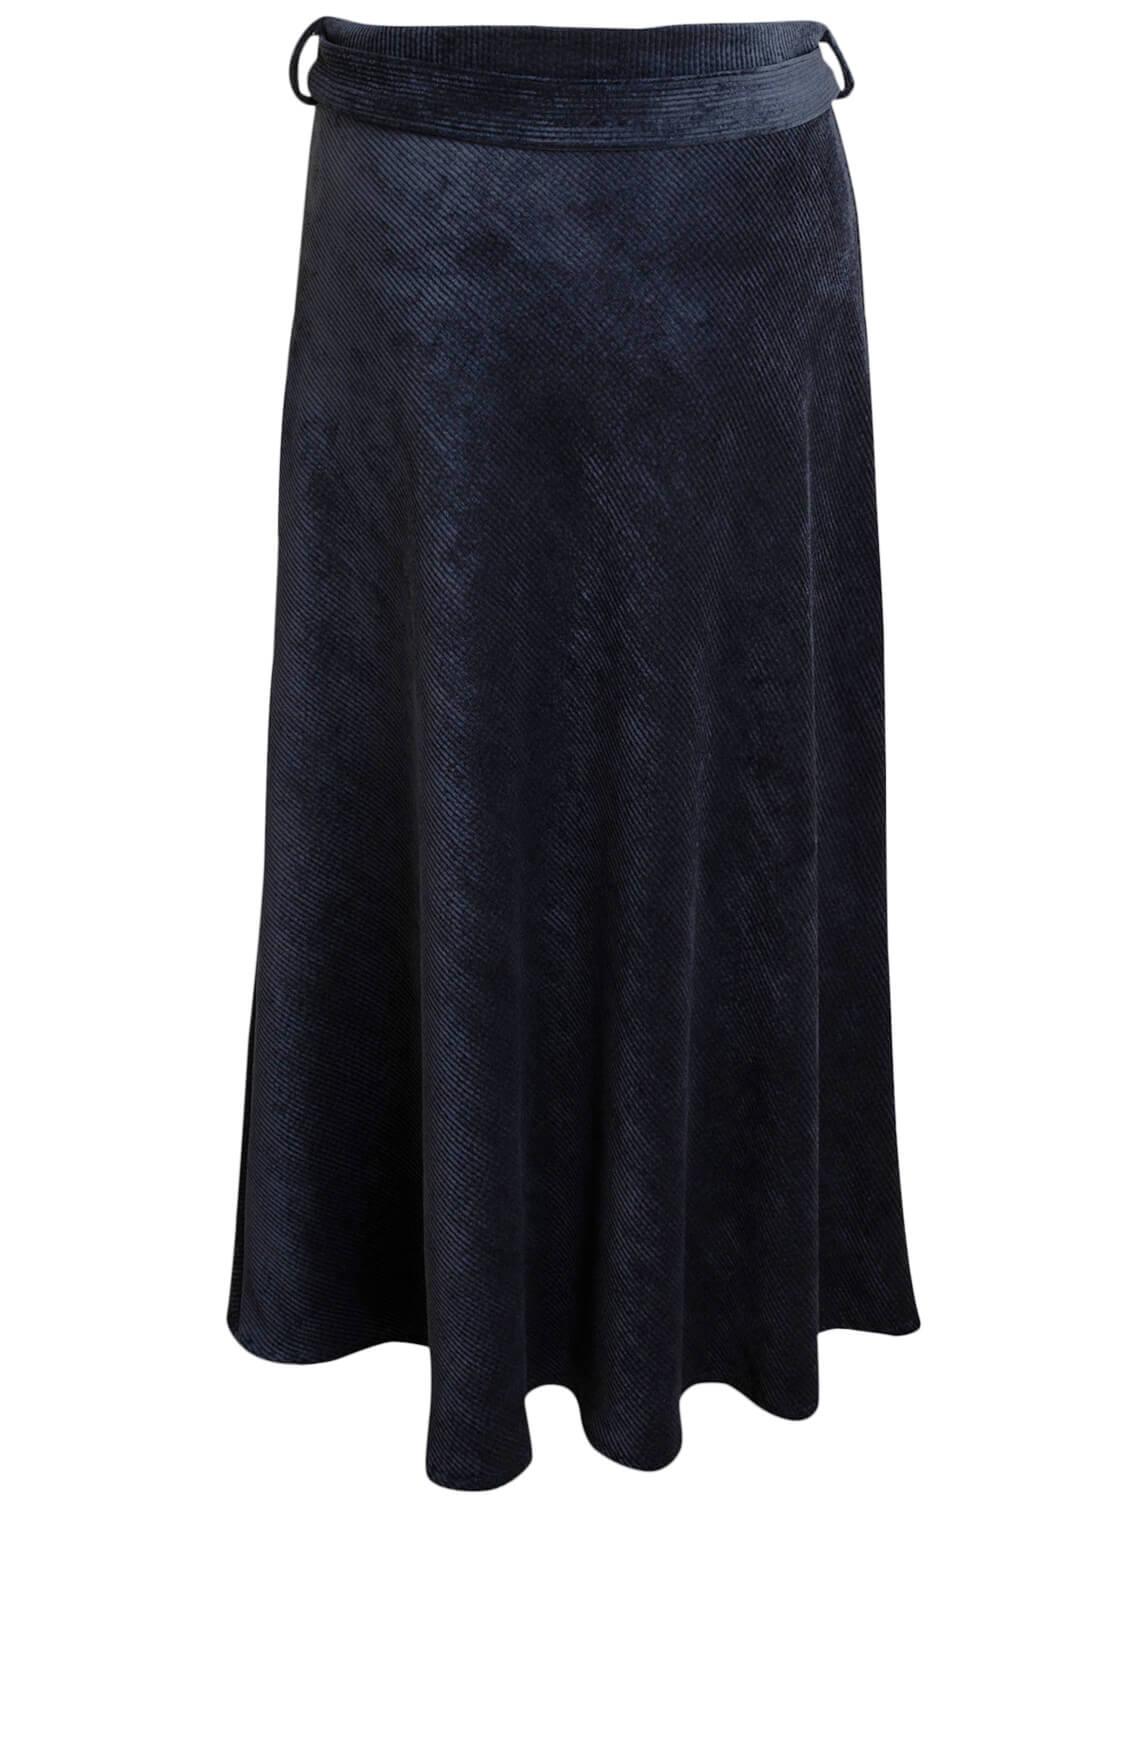 La Fée Maraboutée Dames Rib rok Blauw